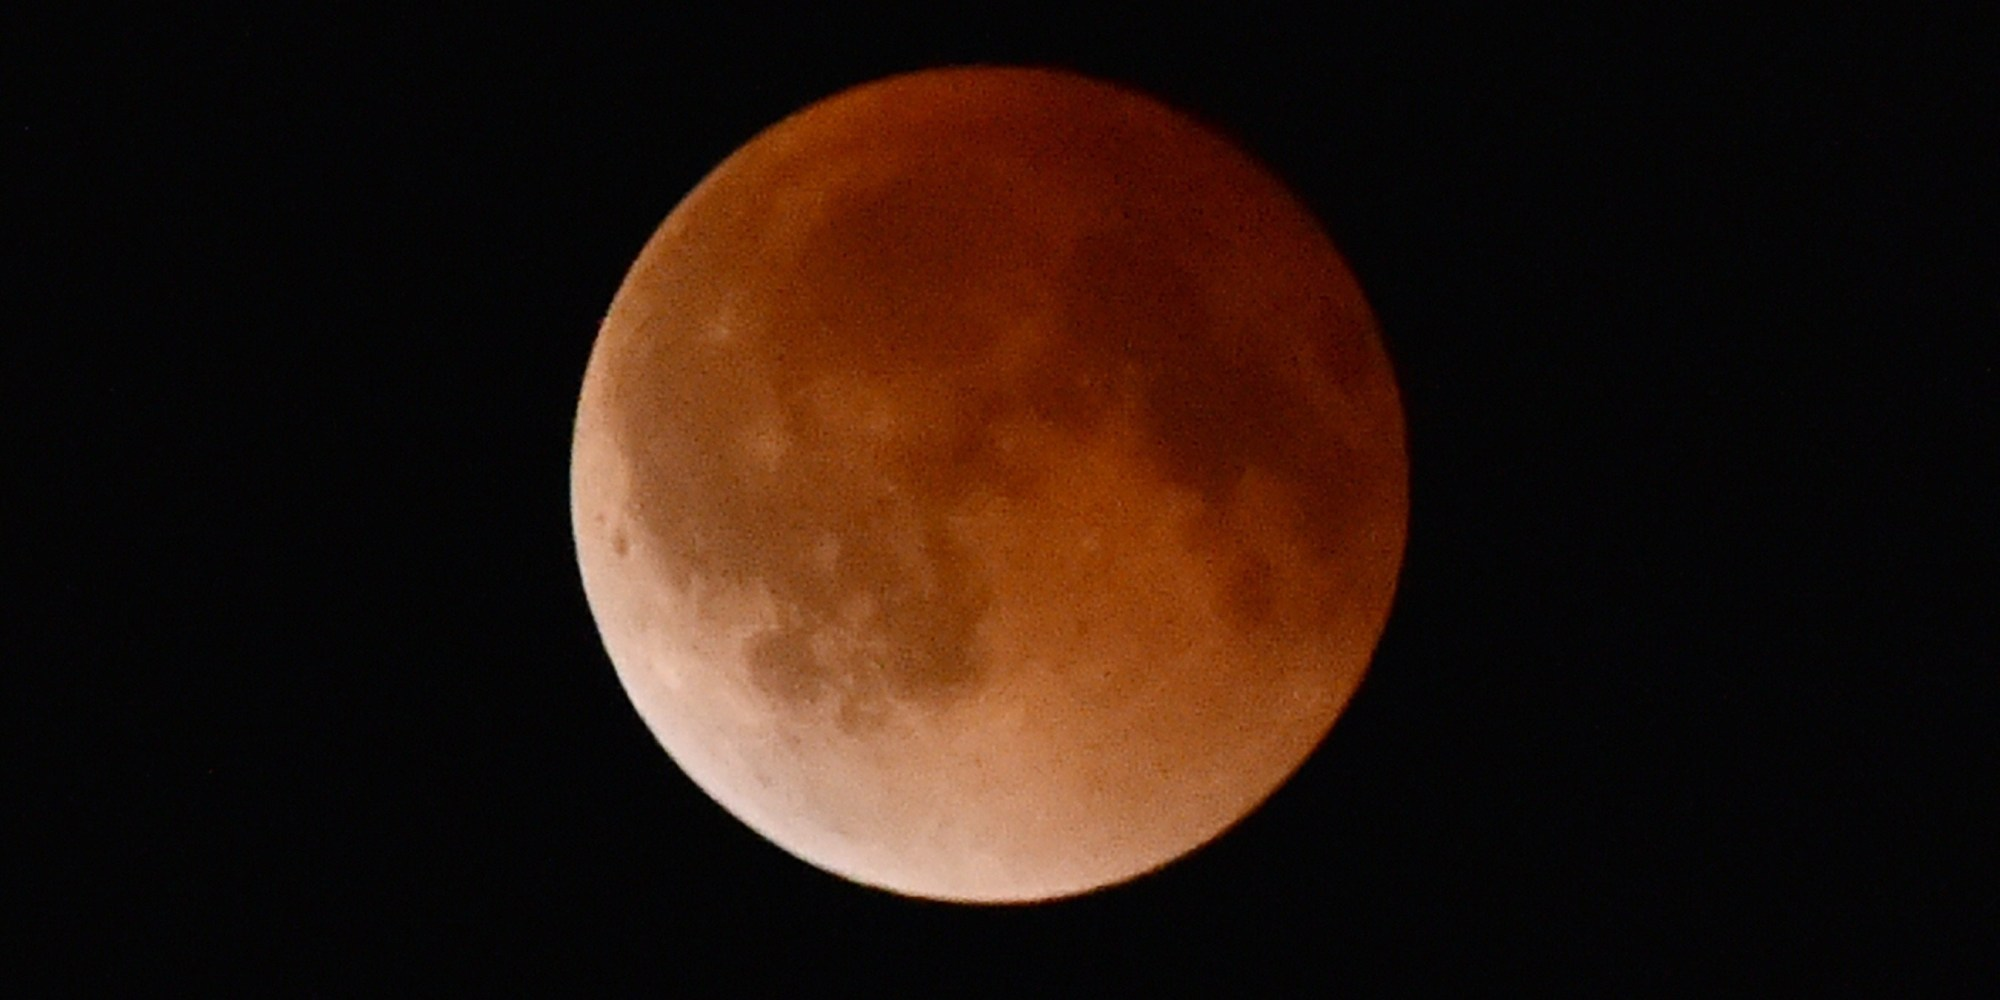 blood moon eclipse online - photo #39